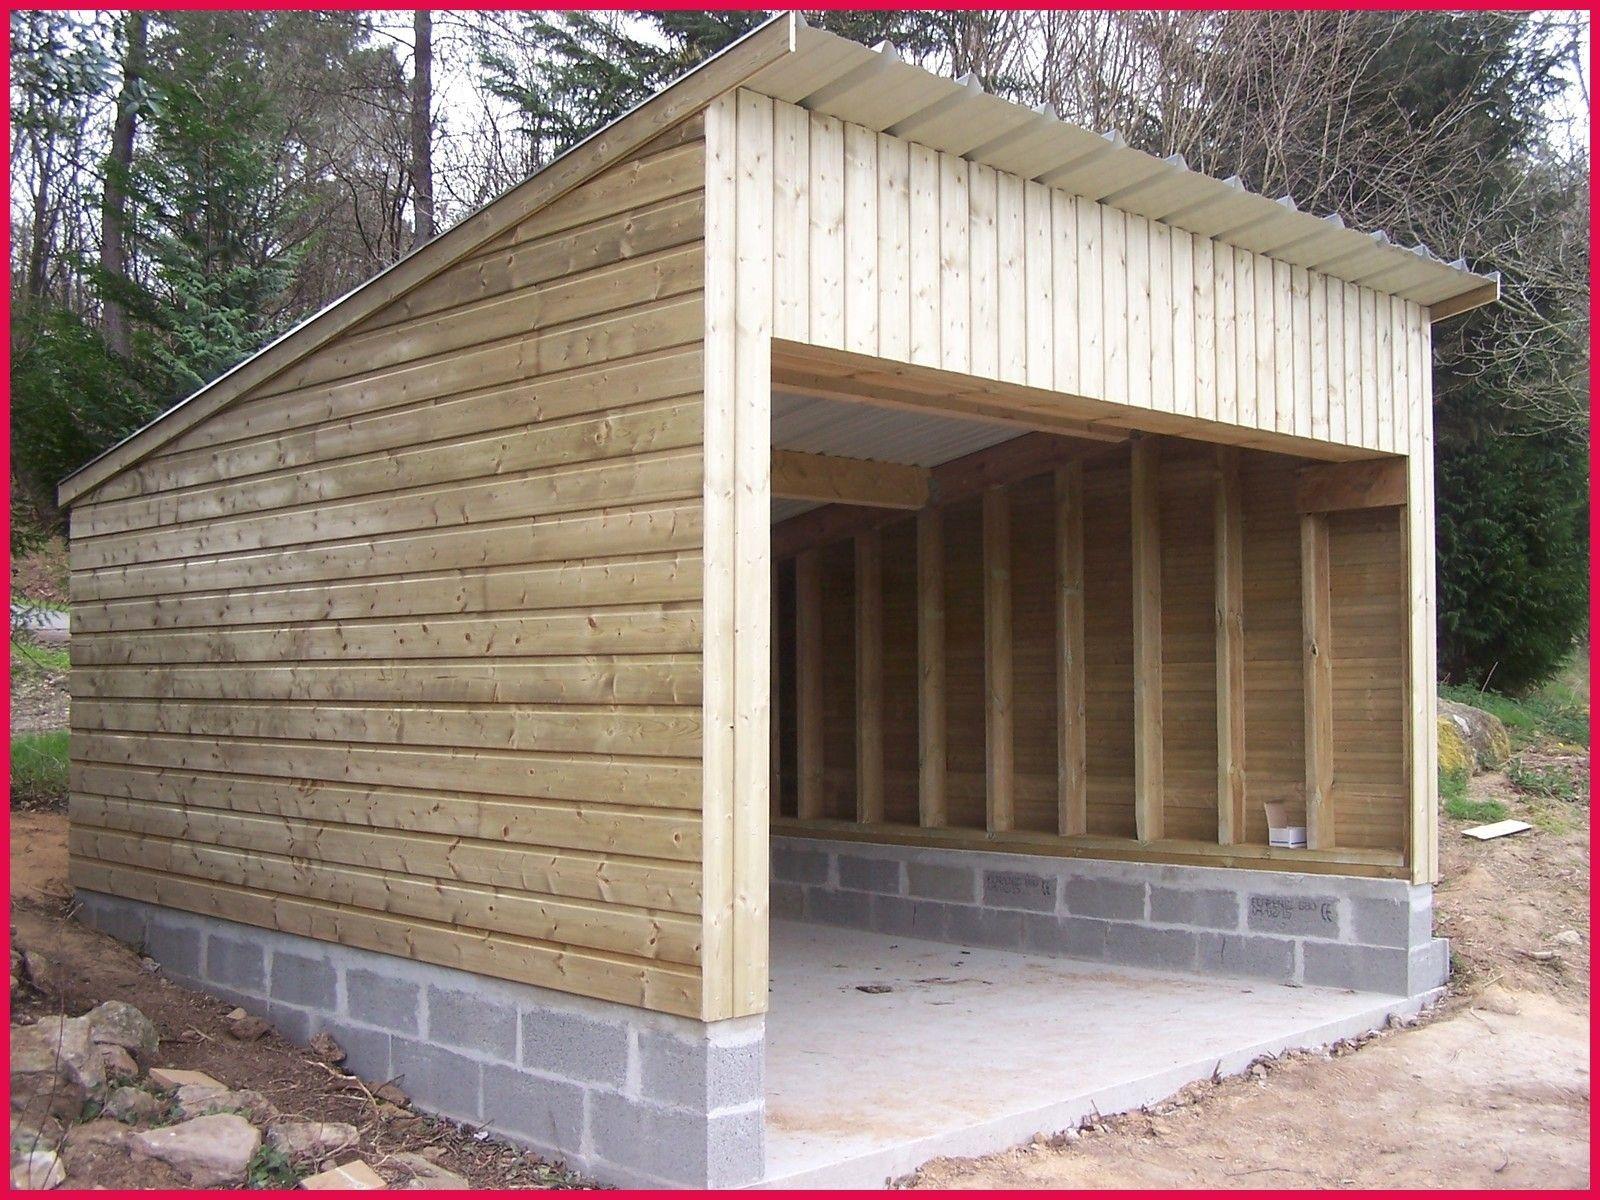 Garage Bois Ou Parpaing Sportsfactoryco Comment Construire Un Davidreed Co In 2020 Garage Backyard Sheds Diy Shed Plans